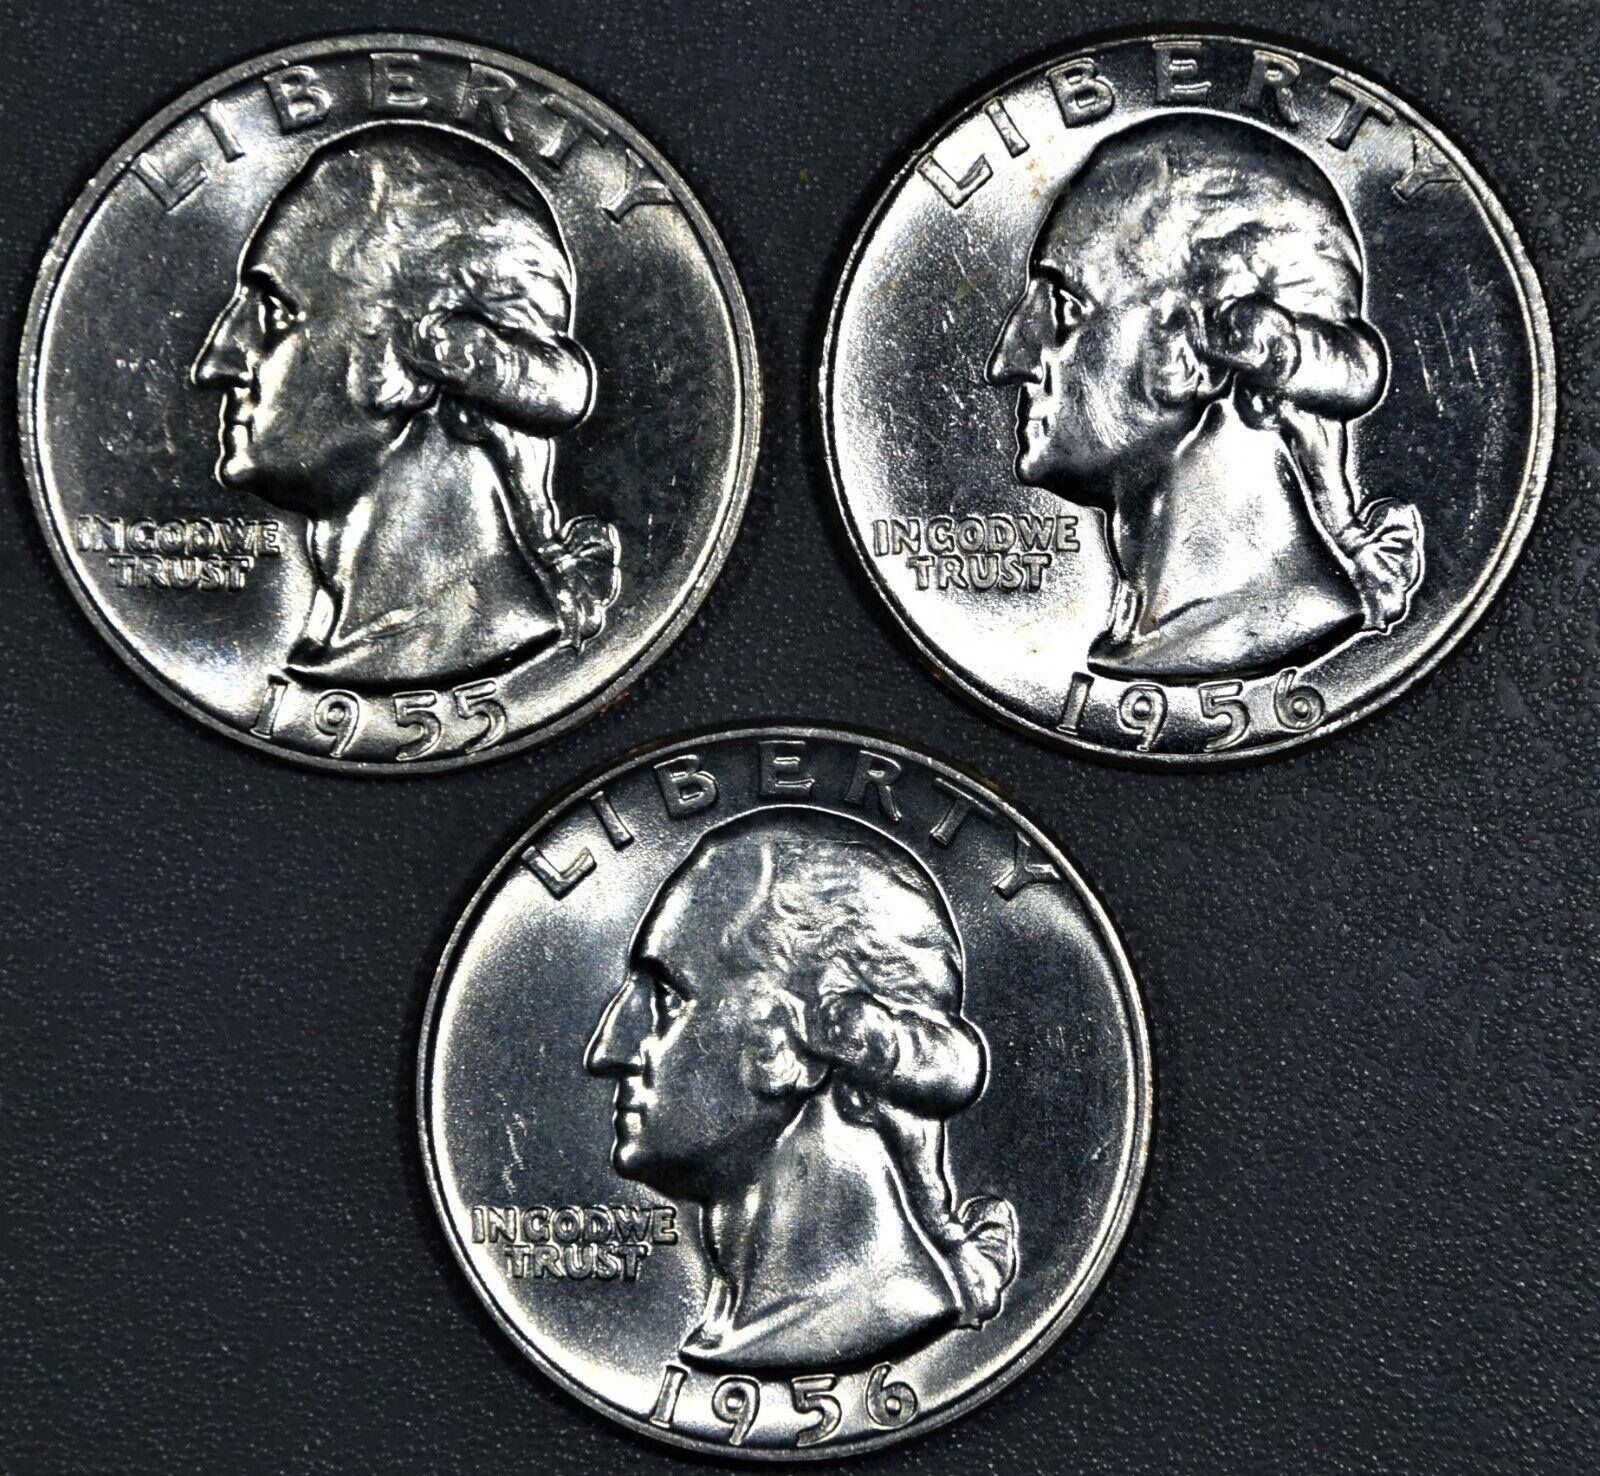 3 25c WASHINGTON SILVER QUARTERS, 1955-D, 1956, 1956-D, GRADES CHOICE BU, 2873 - $22.50